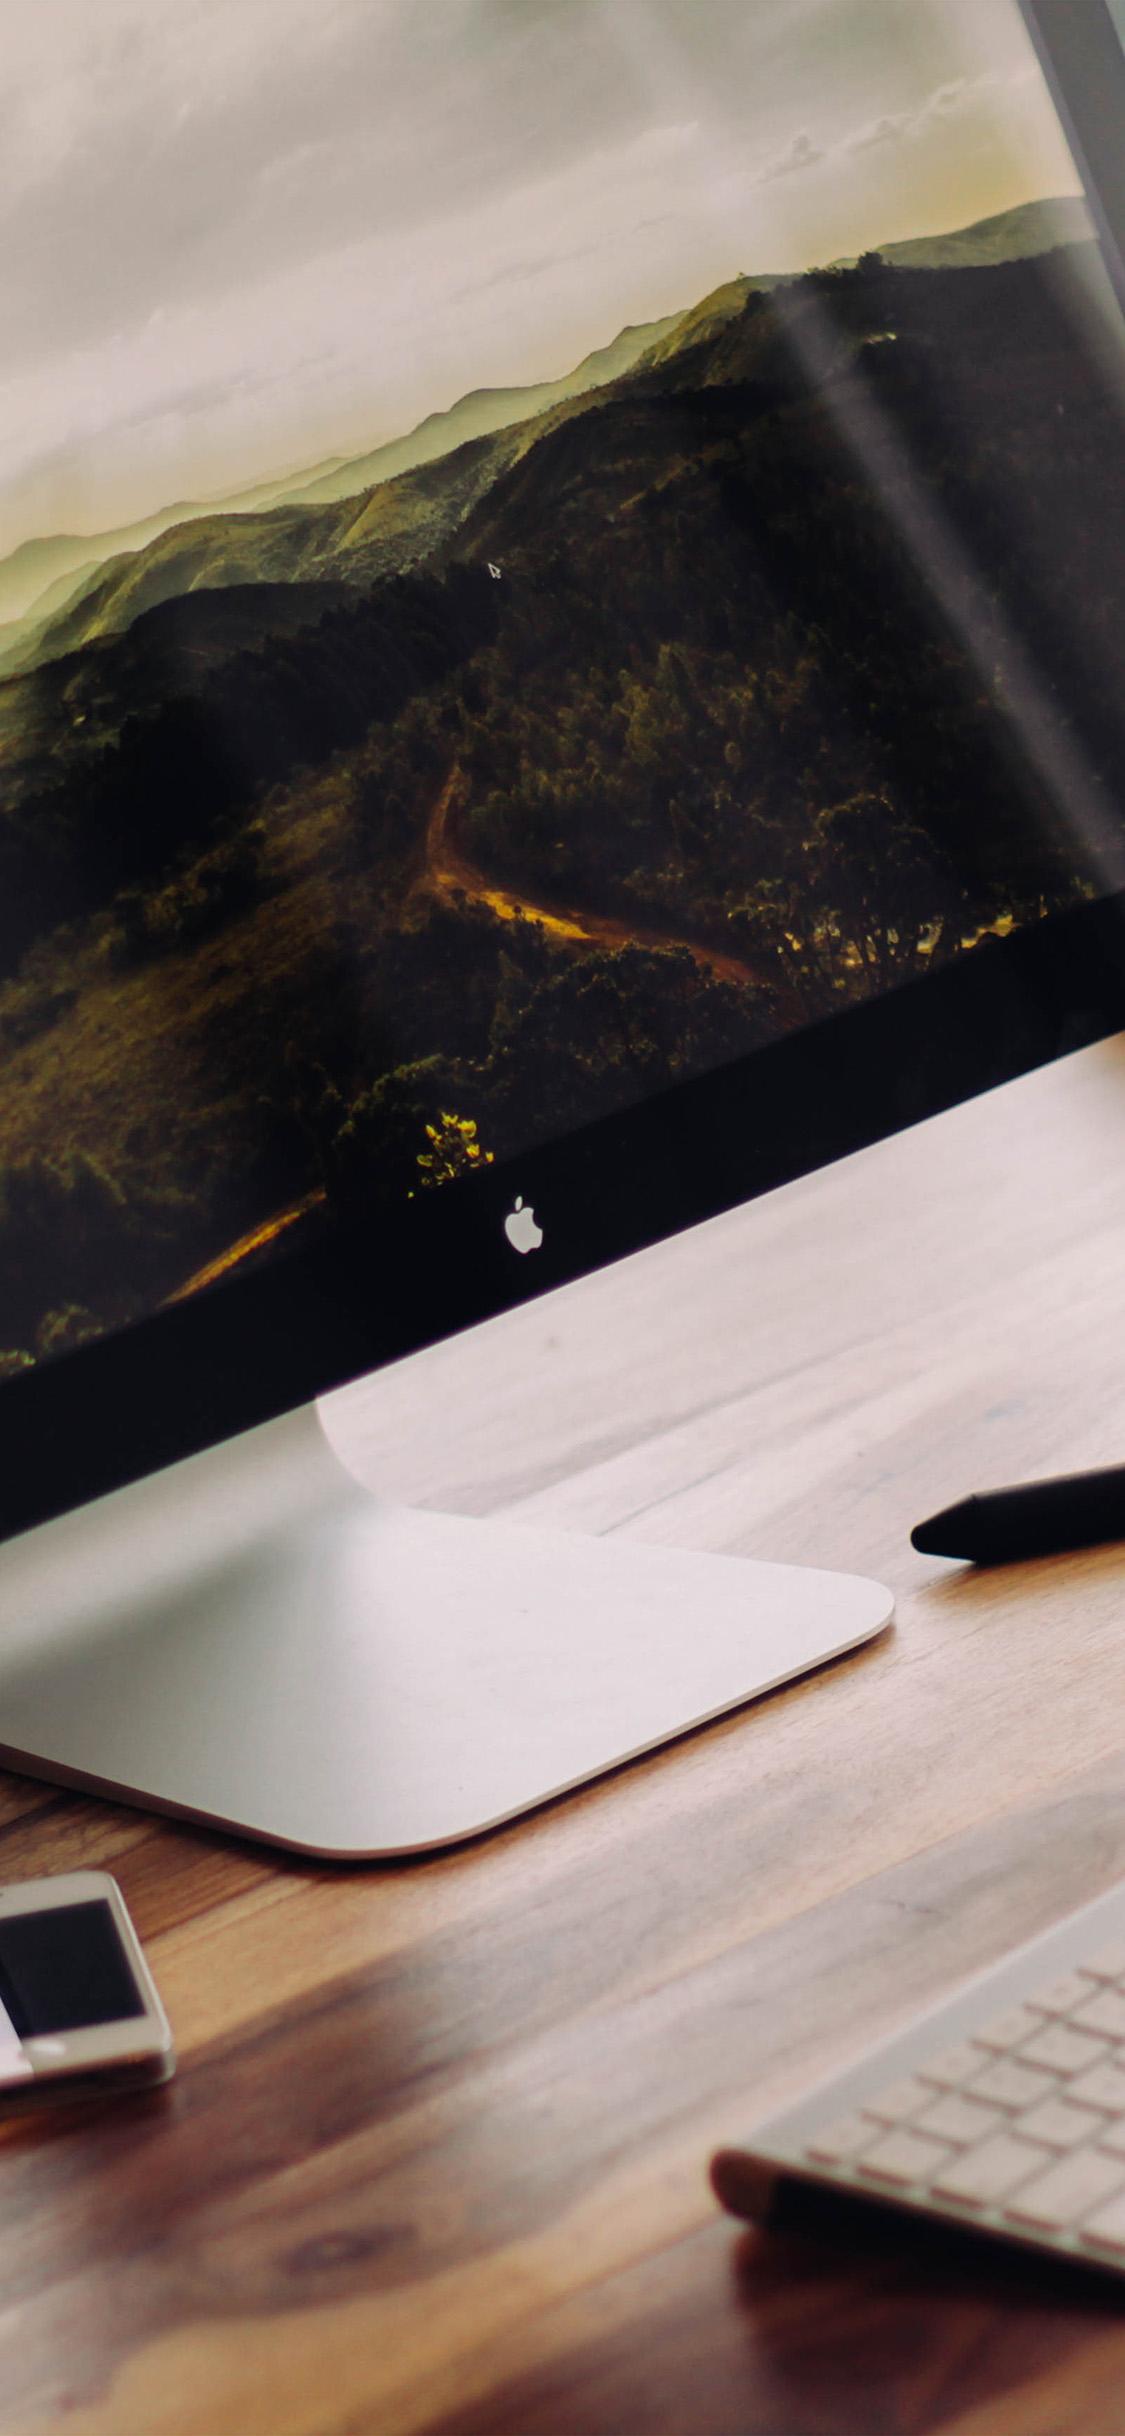 iPhonexpapers.com-Apple-iPhone-wallpaper-nz44-mac-apple-desk-nomad-nature